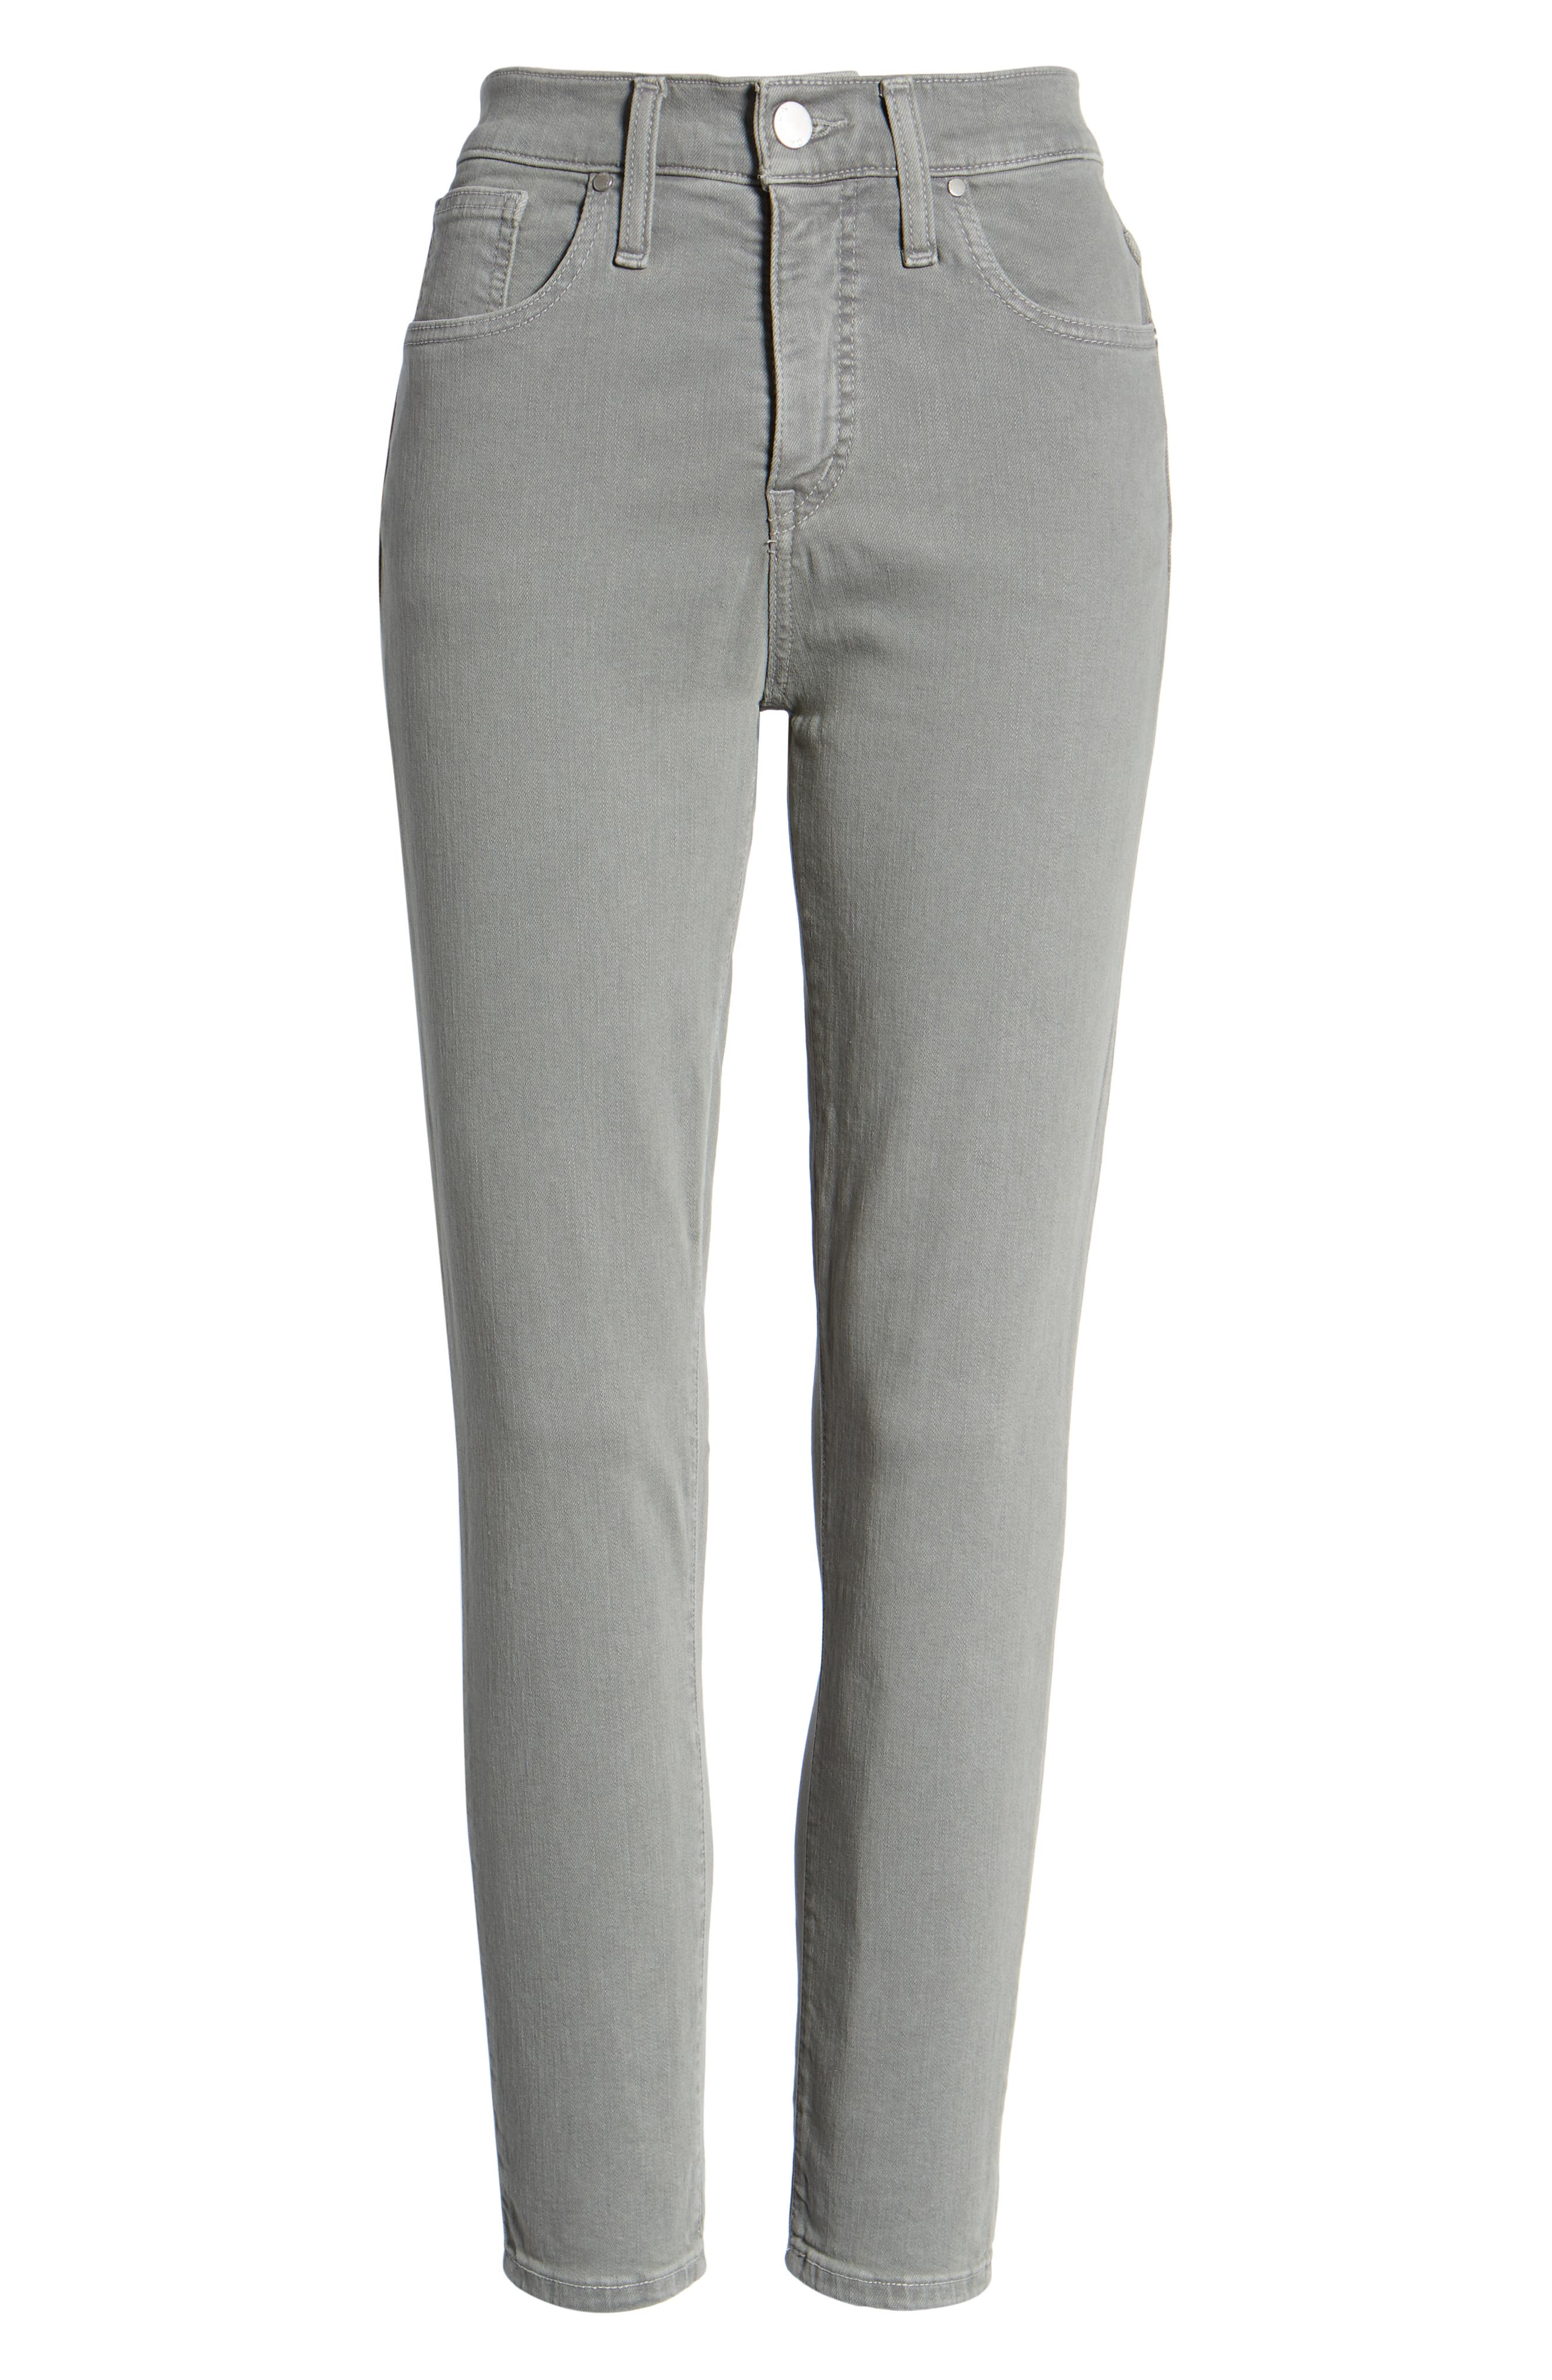 Sierra High Waist Ankle Skinny Pants,                             Alternate thumbnail 7, color,                             GREY